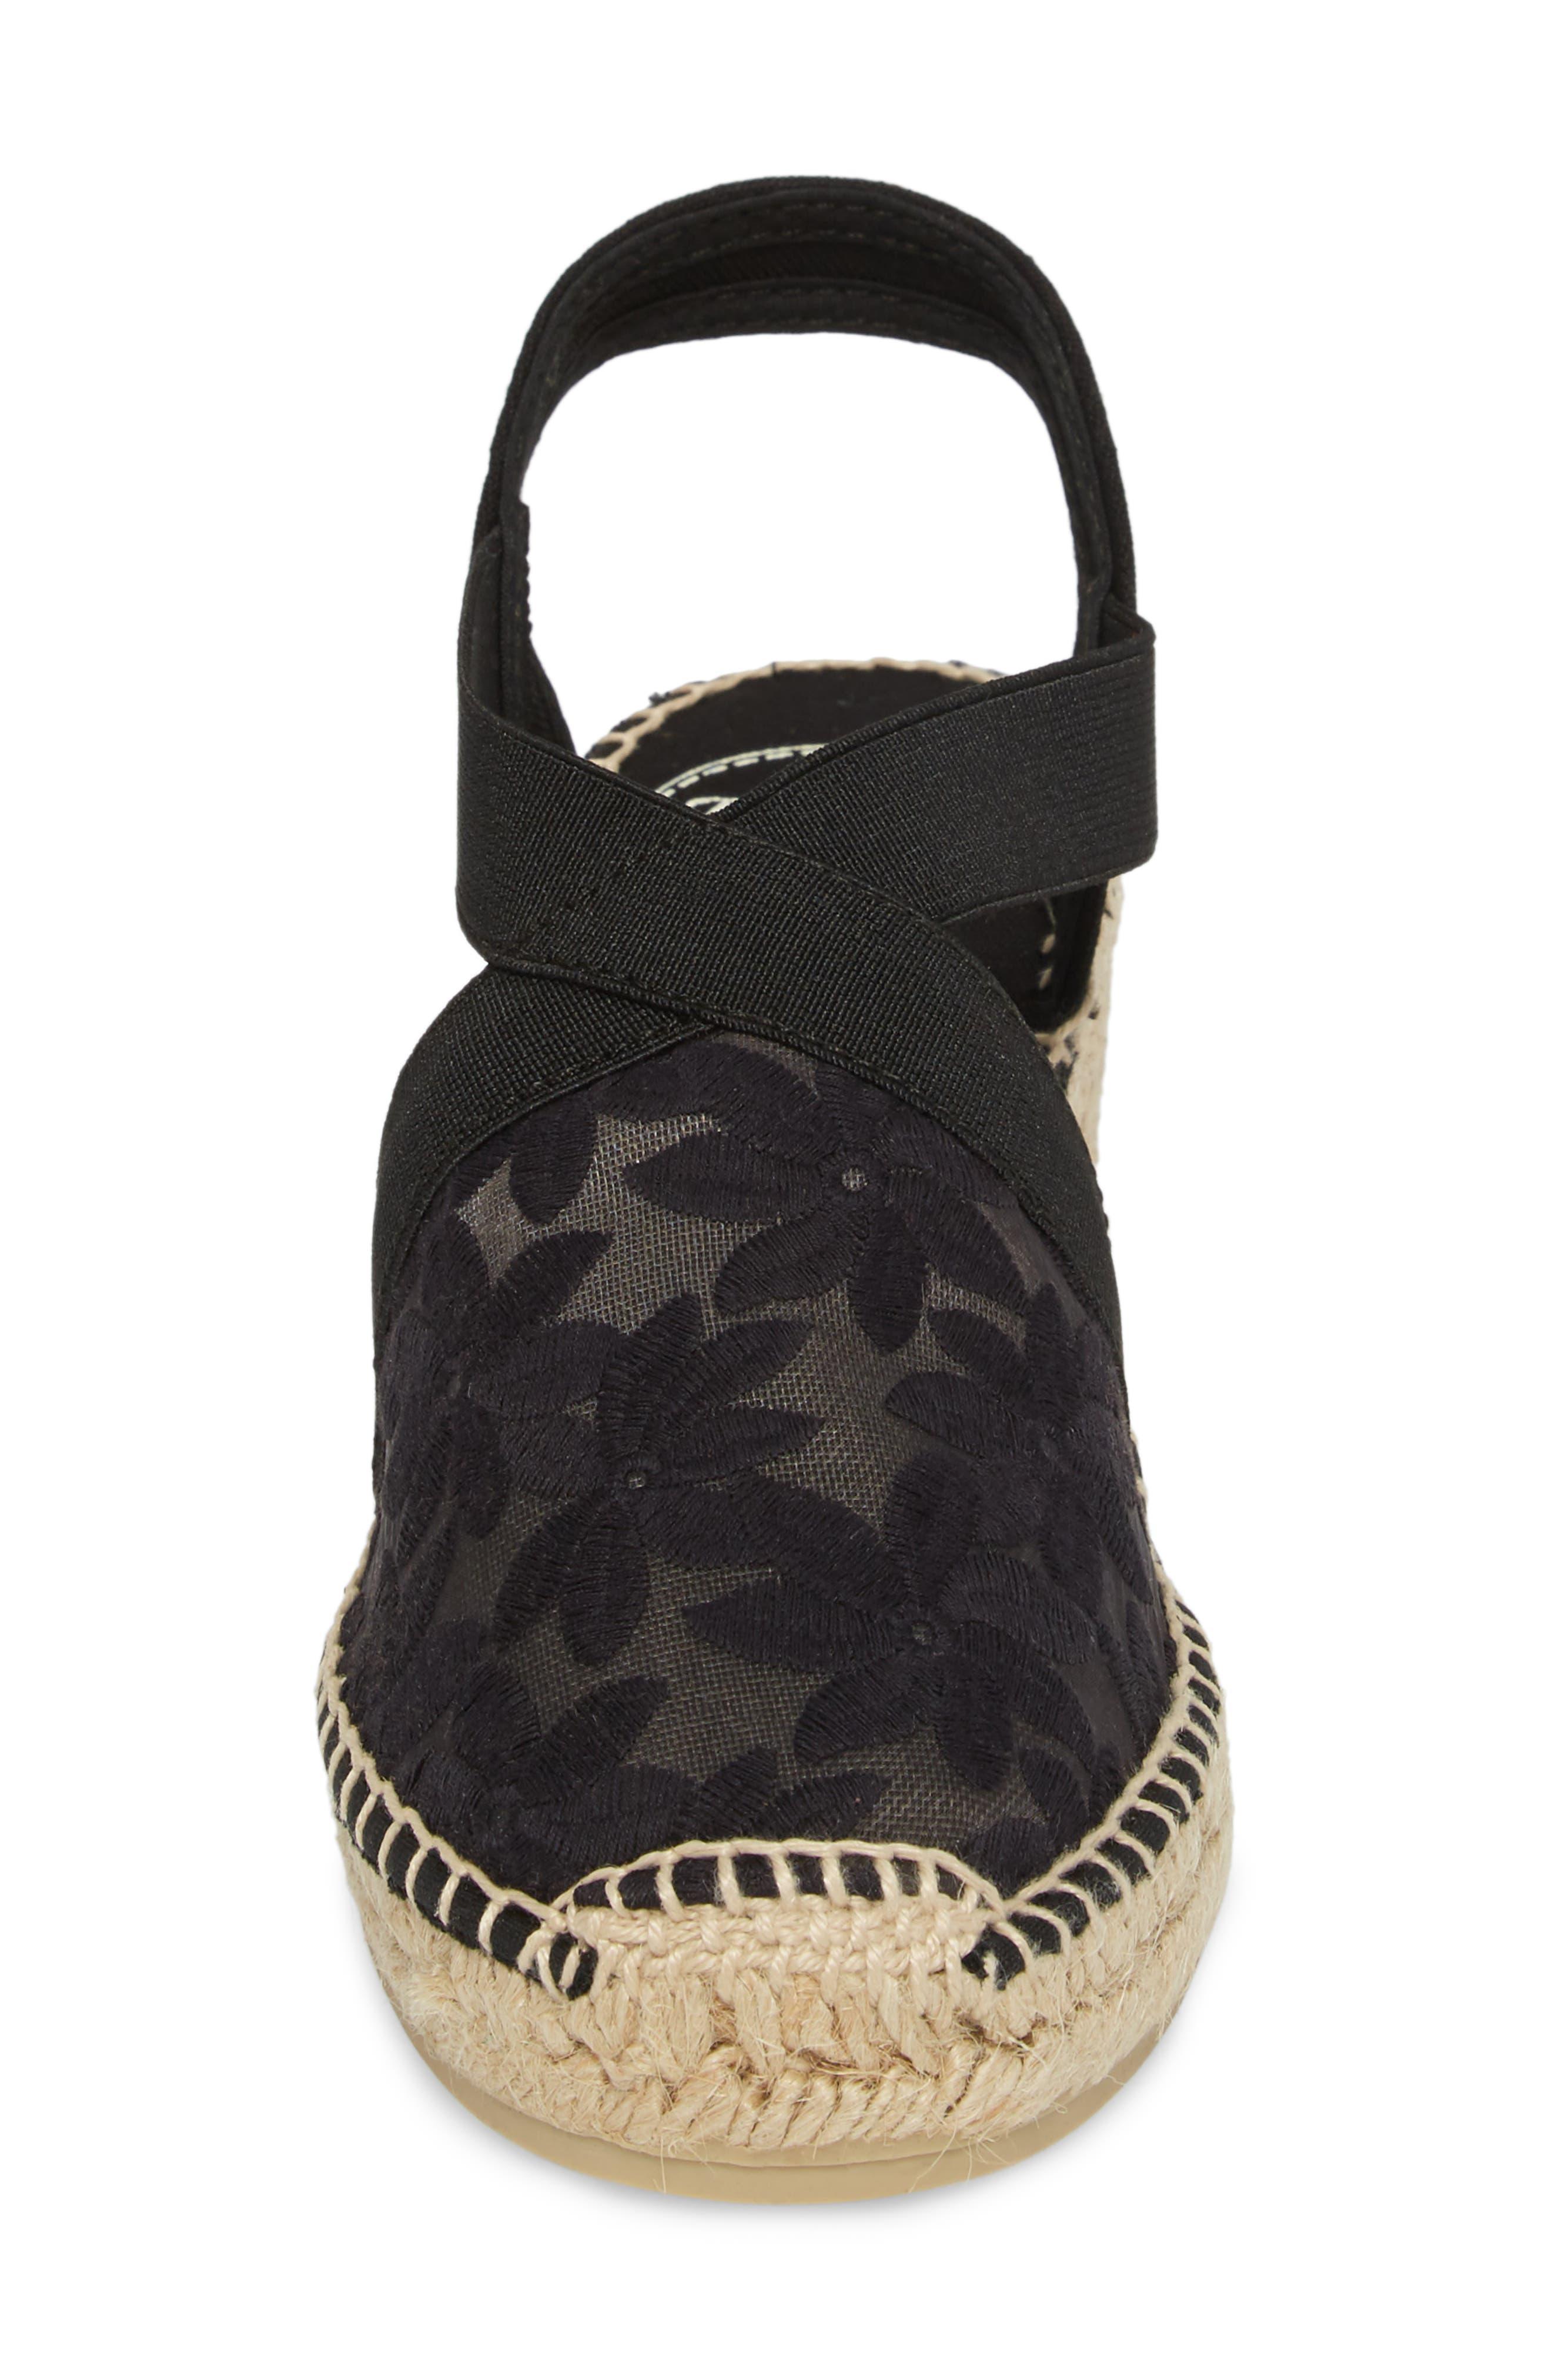 Terra Espadrille Wedge Sandal,                             Alternate thumbnail 4, color,                             Black Fabric